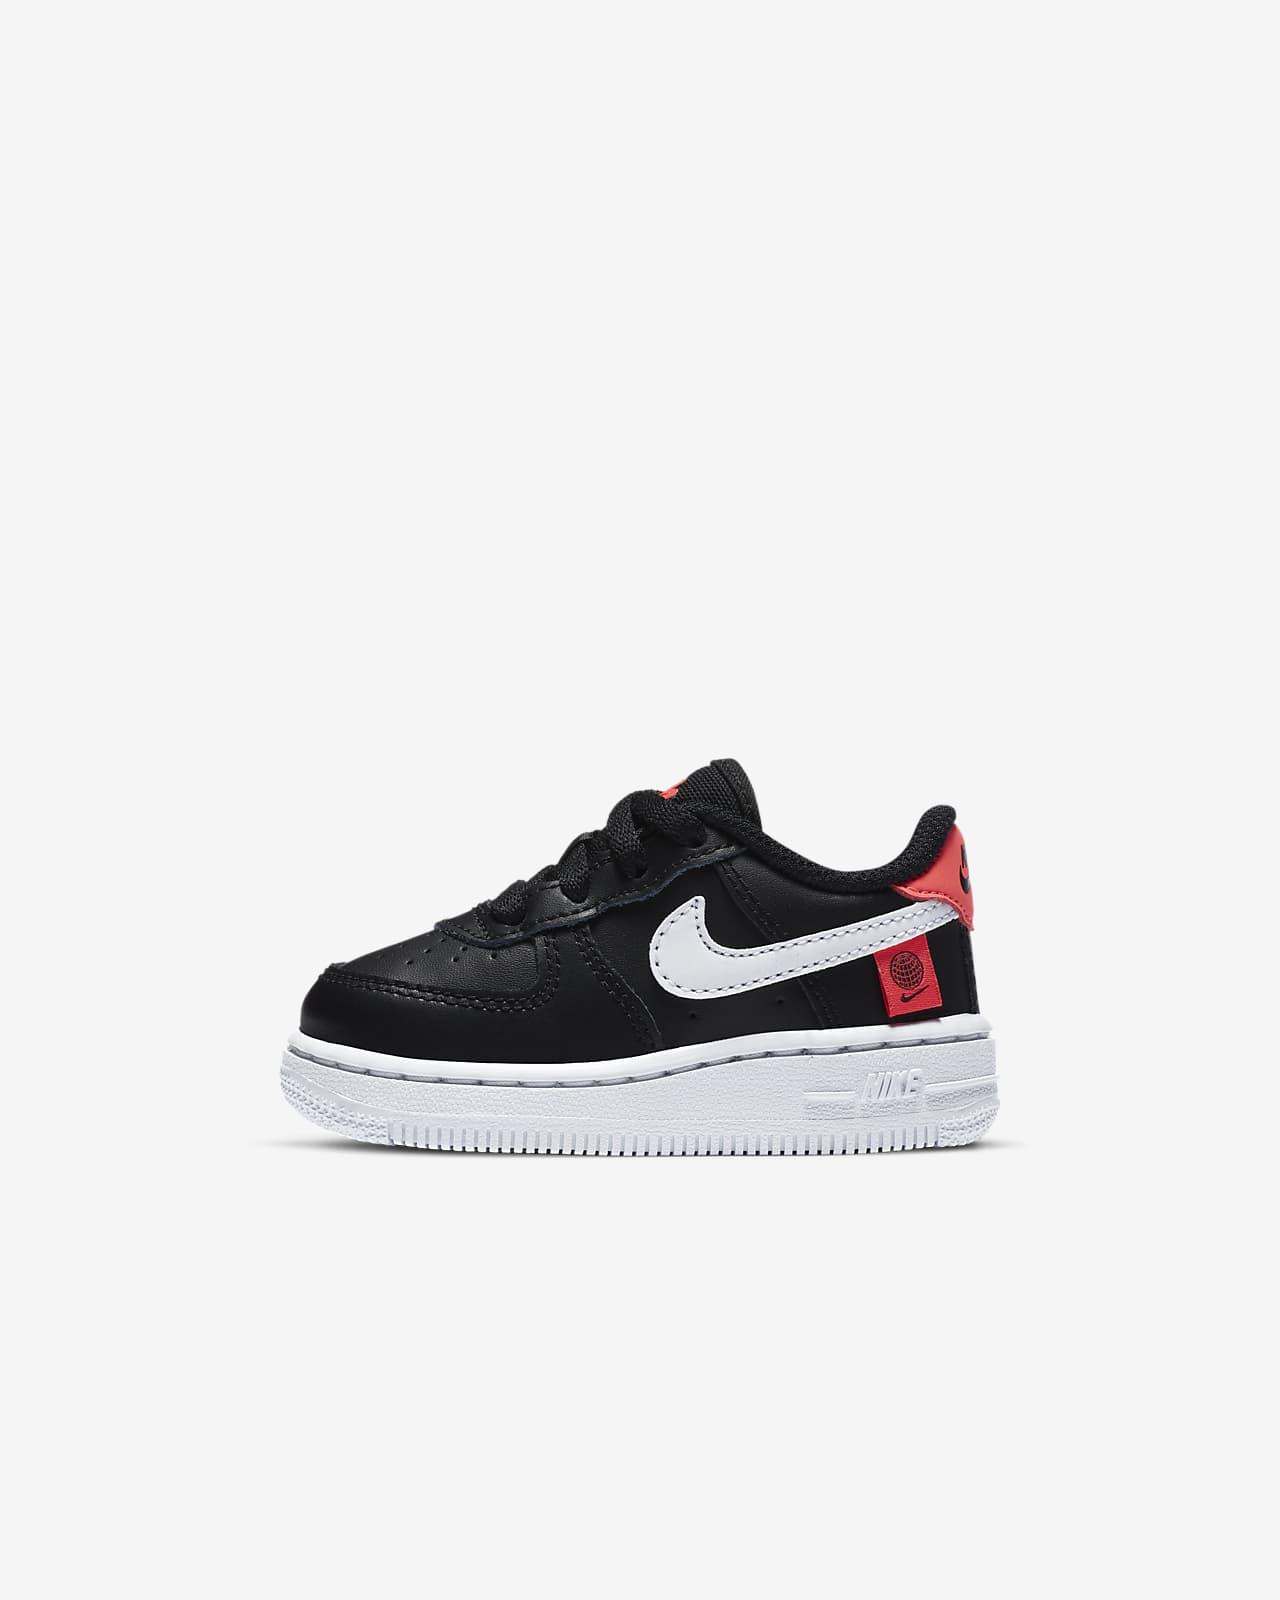 Nike Force 1 WW Baby/Toddler Shoe. Nike LU